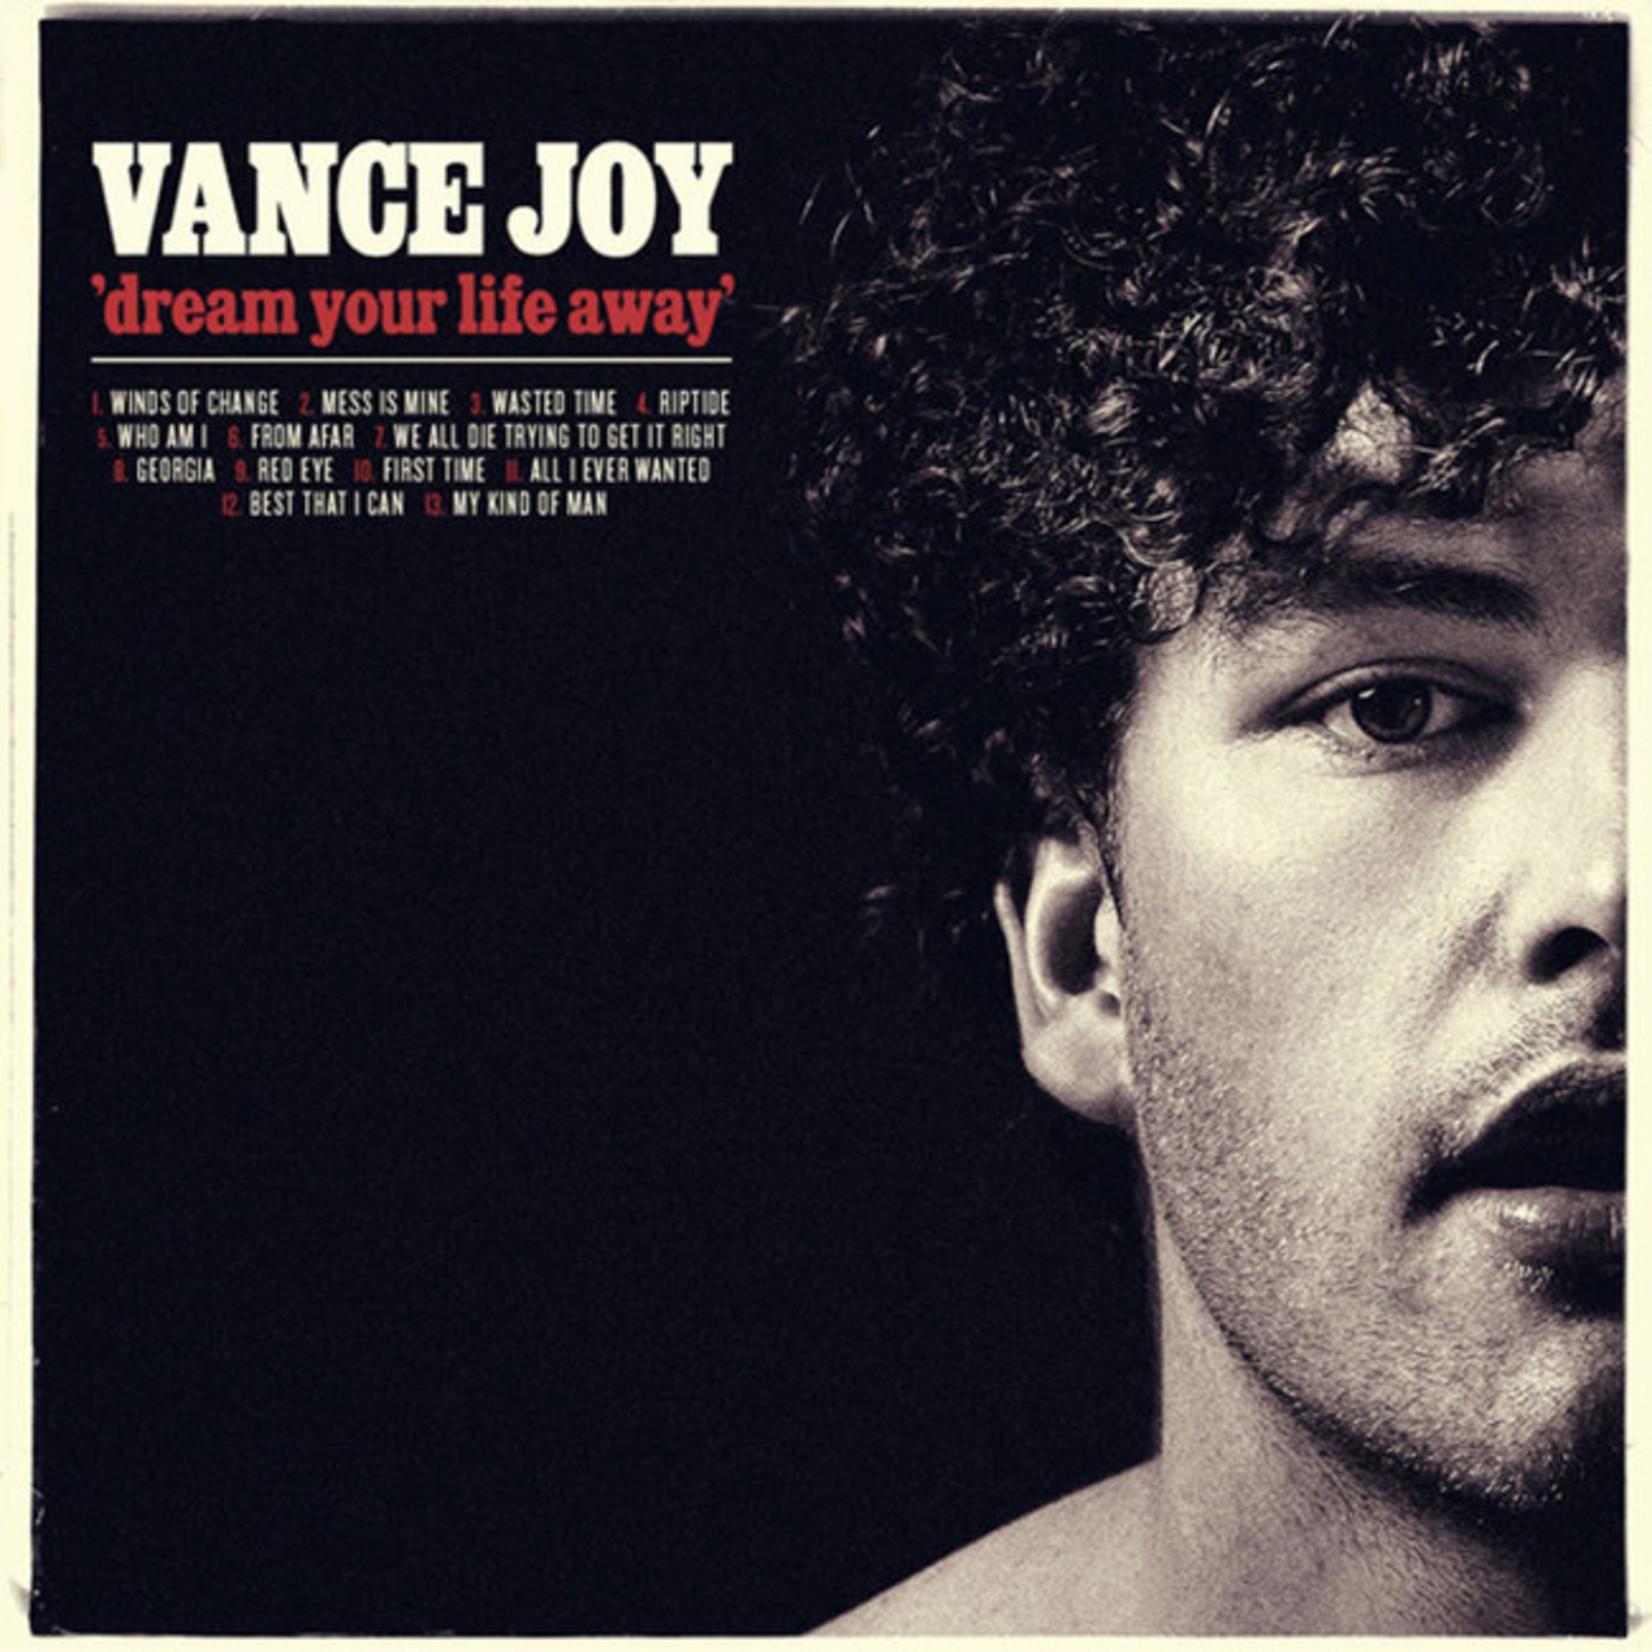 [New] Vance Joy: Dream Your Life Away